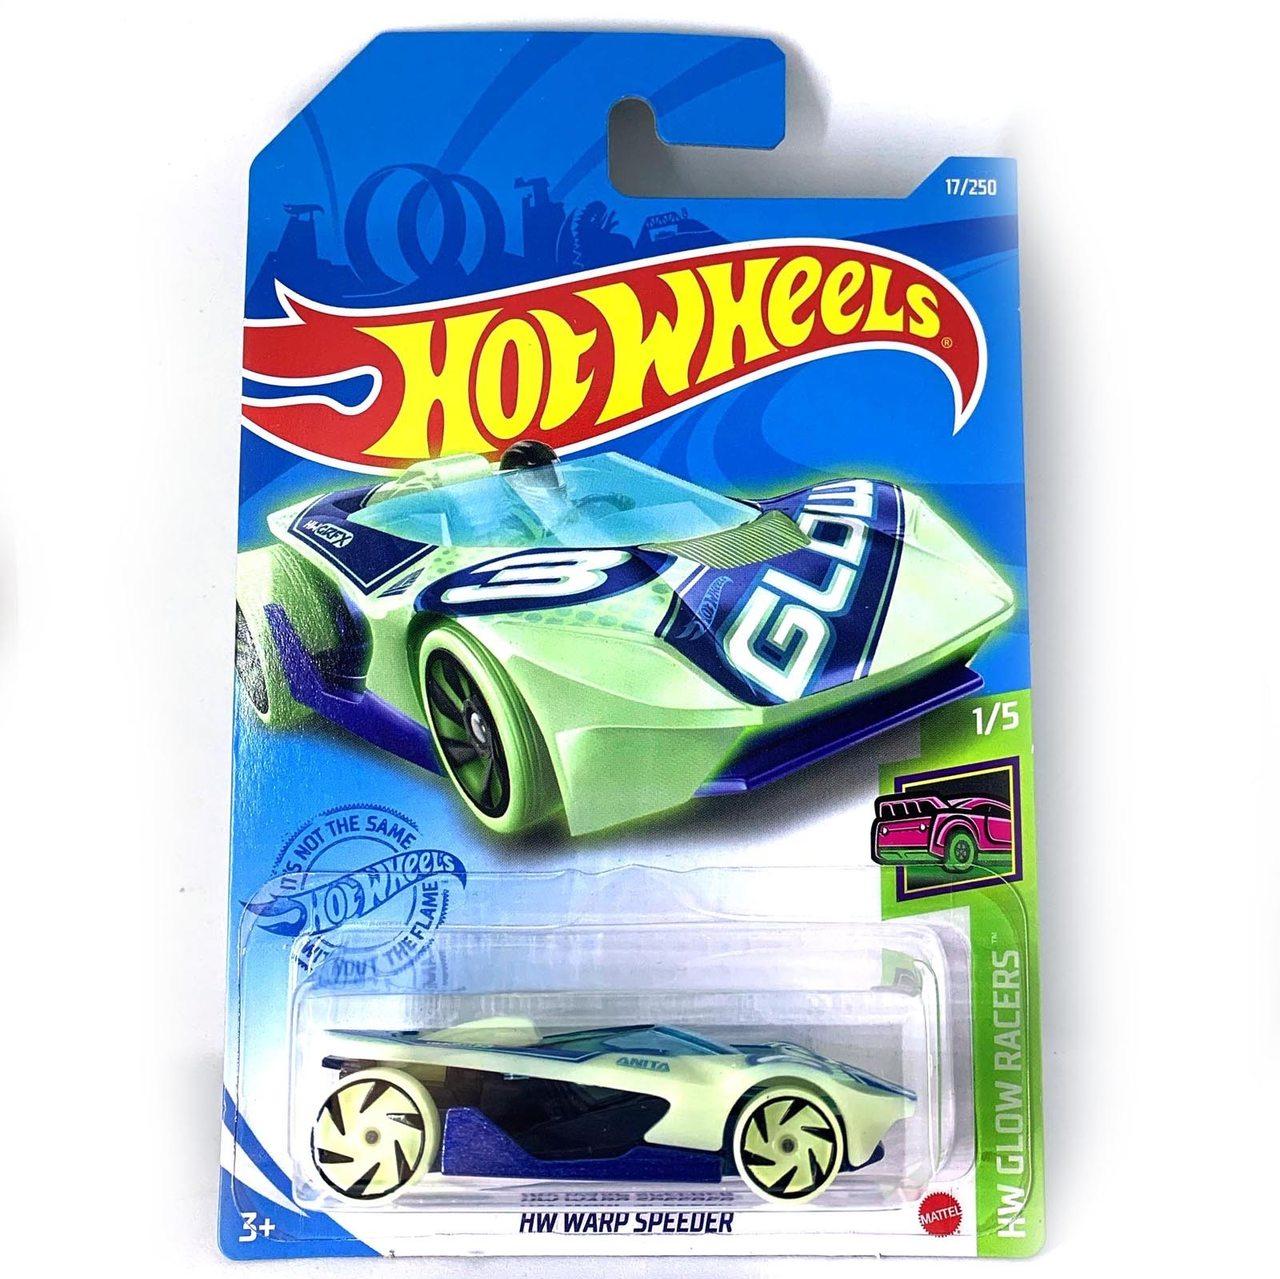 Carrinho Hot Wheels HW WARP Speeder HW Glow Racers - Mattel